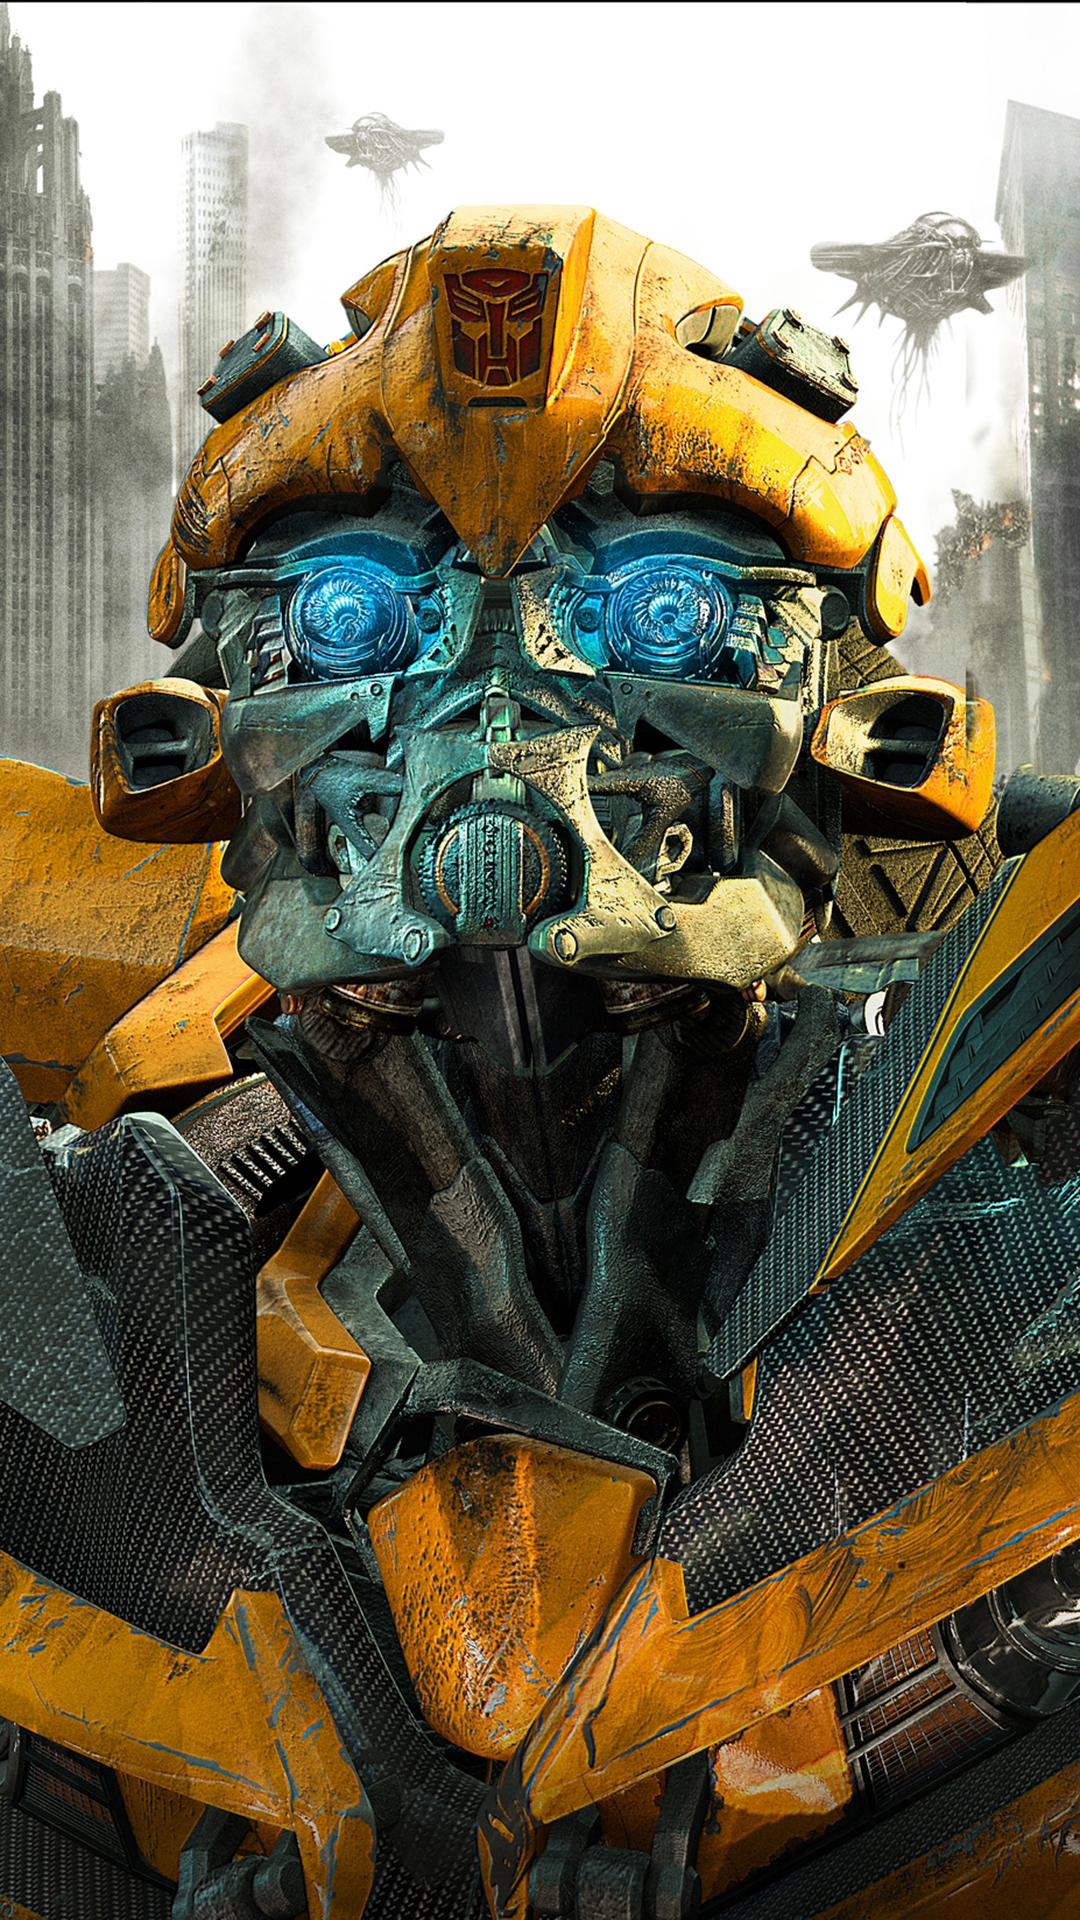 Transformers Autobot Bumblebee htc one wallpaper   Best htc one 1080x1920